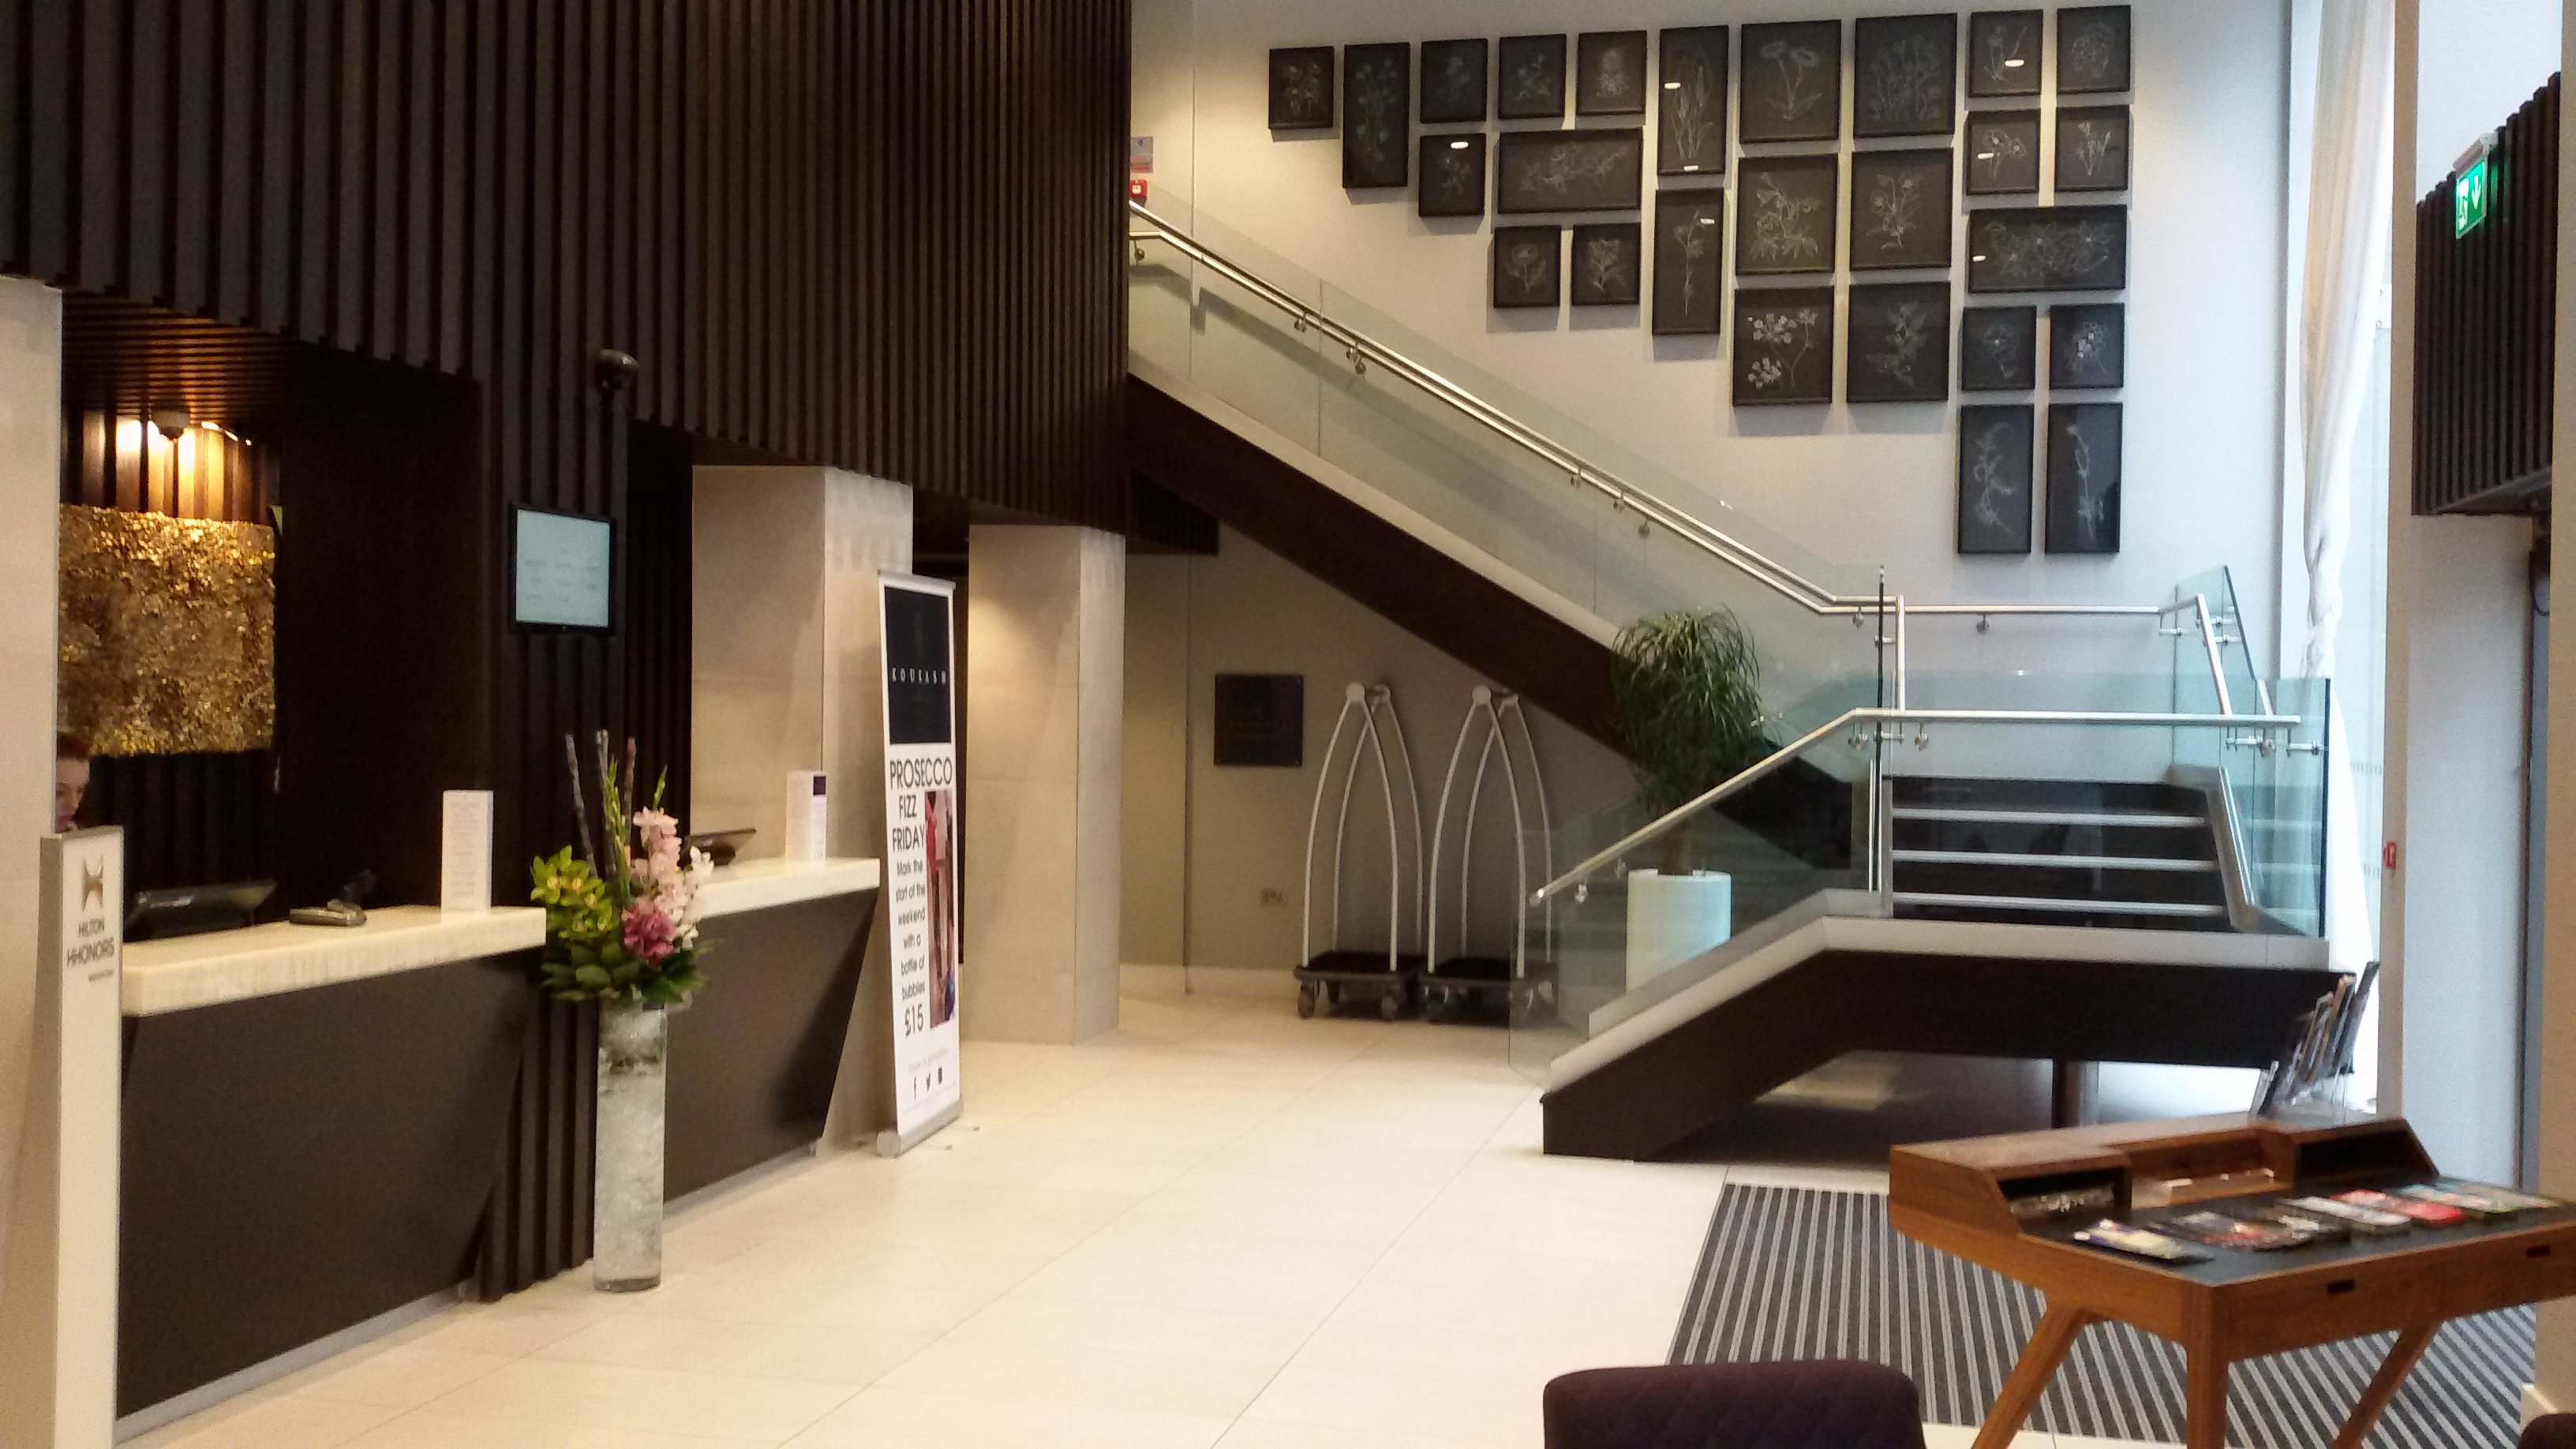 DoubleTree by Hilton Hotel & Spa Liverpool   6 Sir Thomas Street, Liverpool L1 6BR   +44 151 556 1222